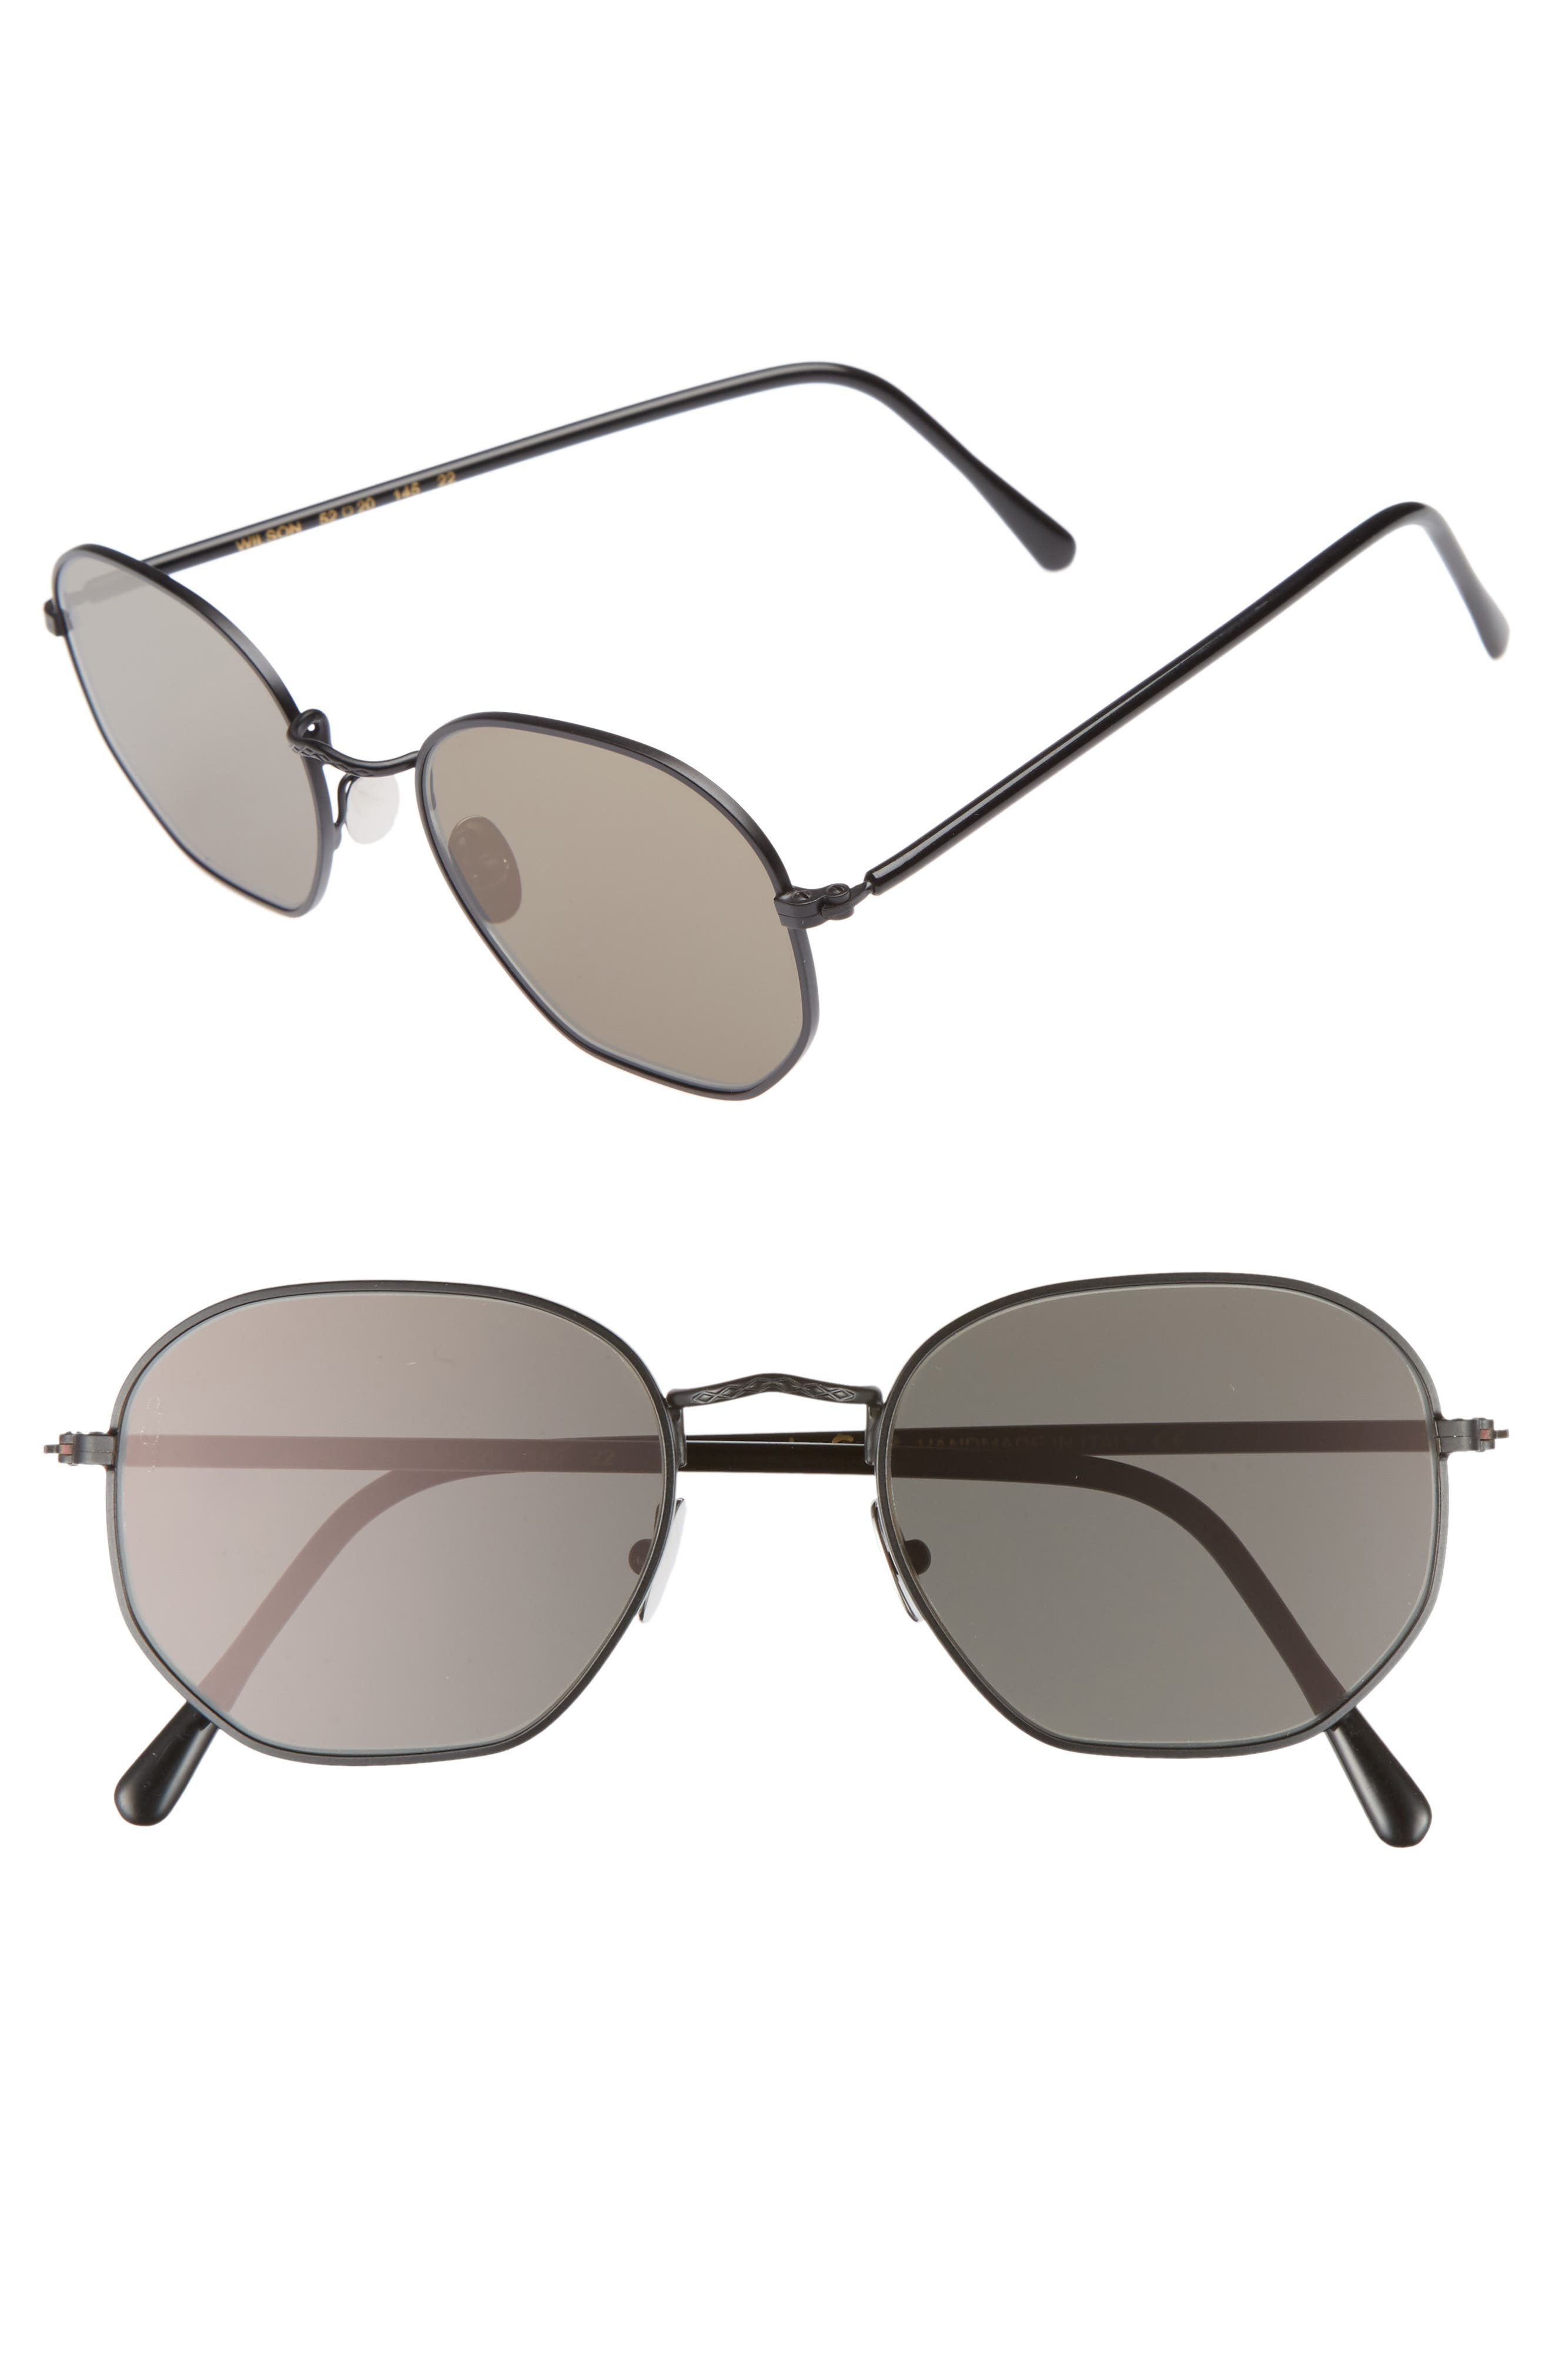 Wilson 52mm Sunglasses,                             Main thumbnail 1, color,                             Black Matte/ Grey